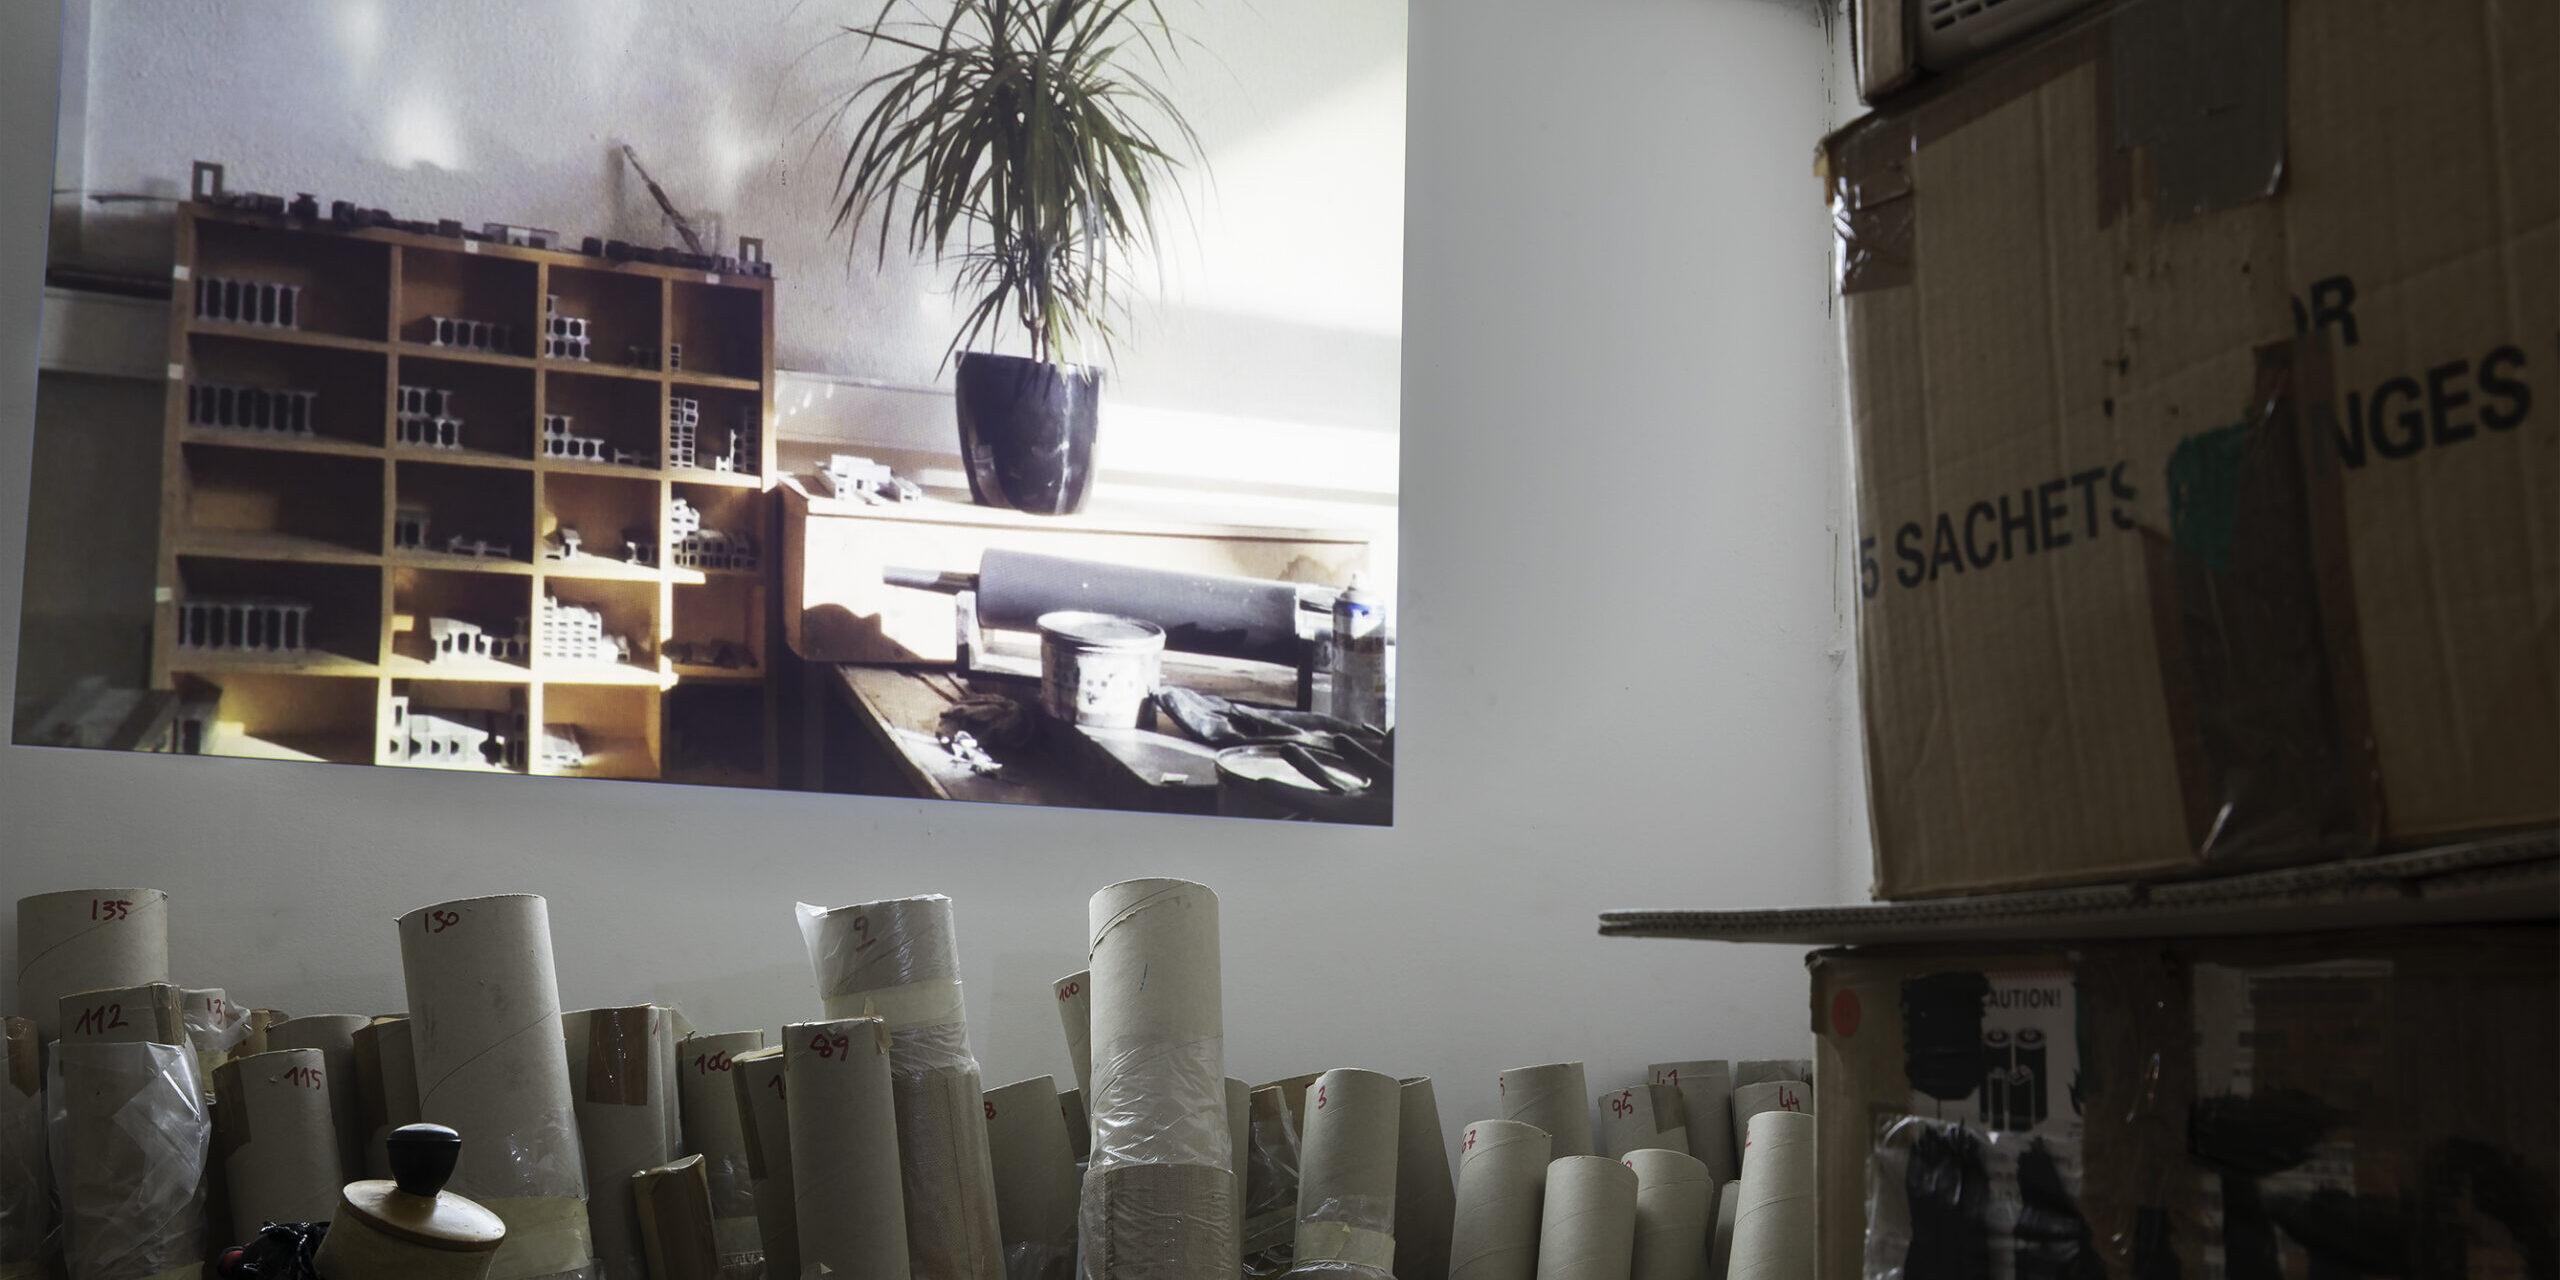 Giulio Squillacciotti, Vrijdag, Antwerpen (2019), installation view Project Room #2, courtesy Archivio Atelier Pharaildis Van den Broeck, ph Jacopo Menzani